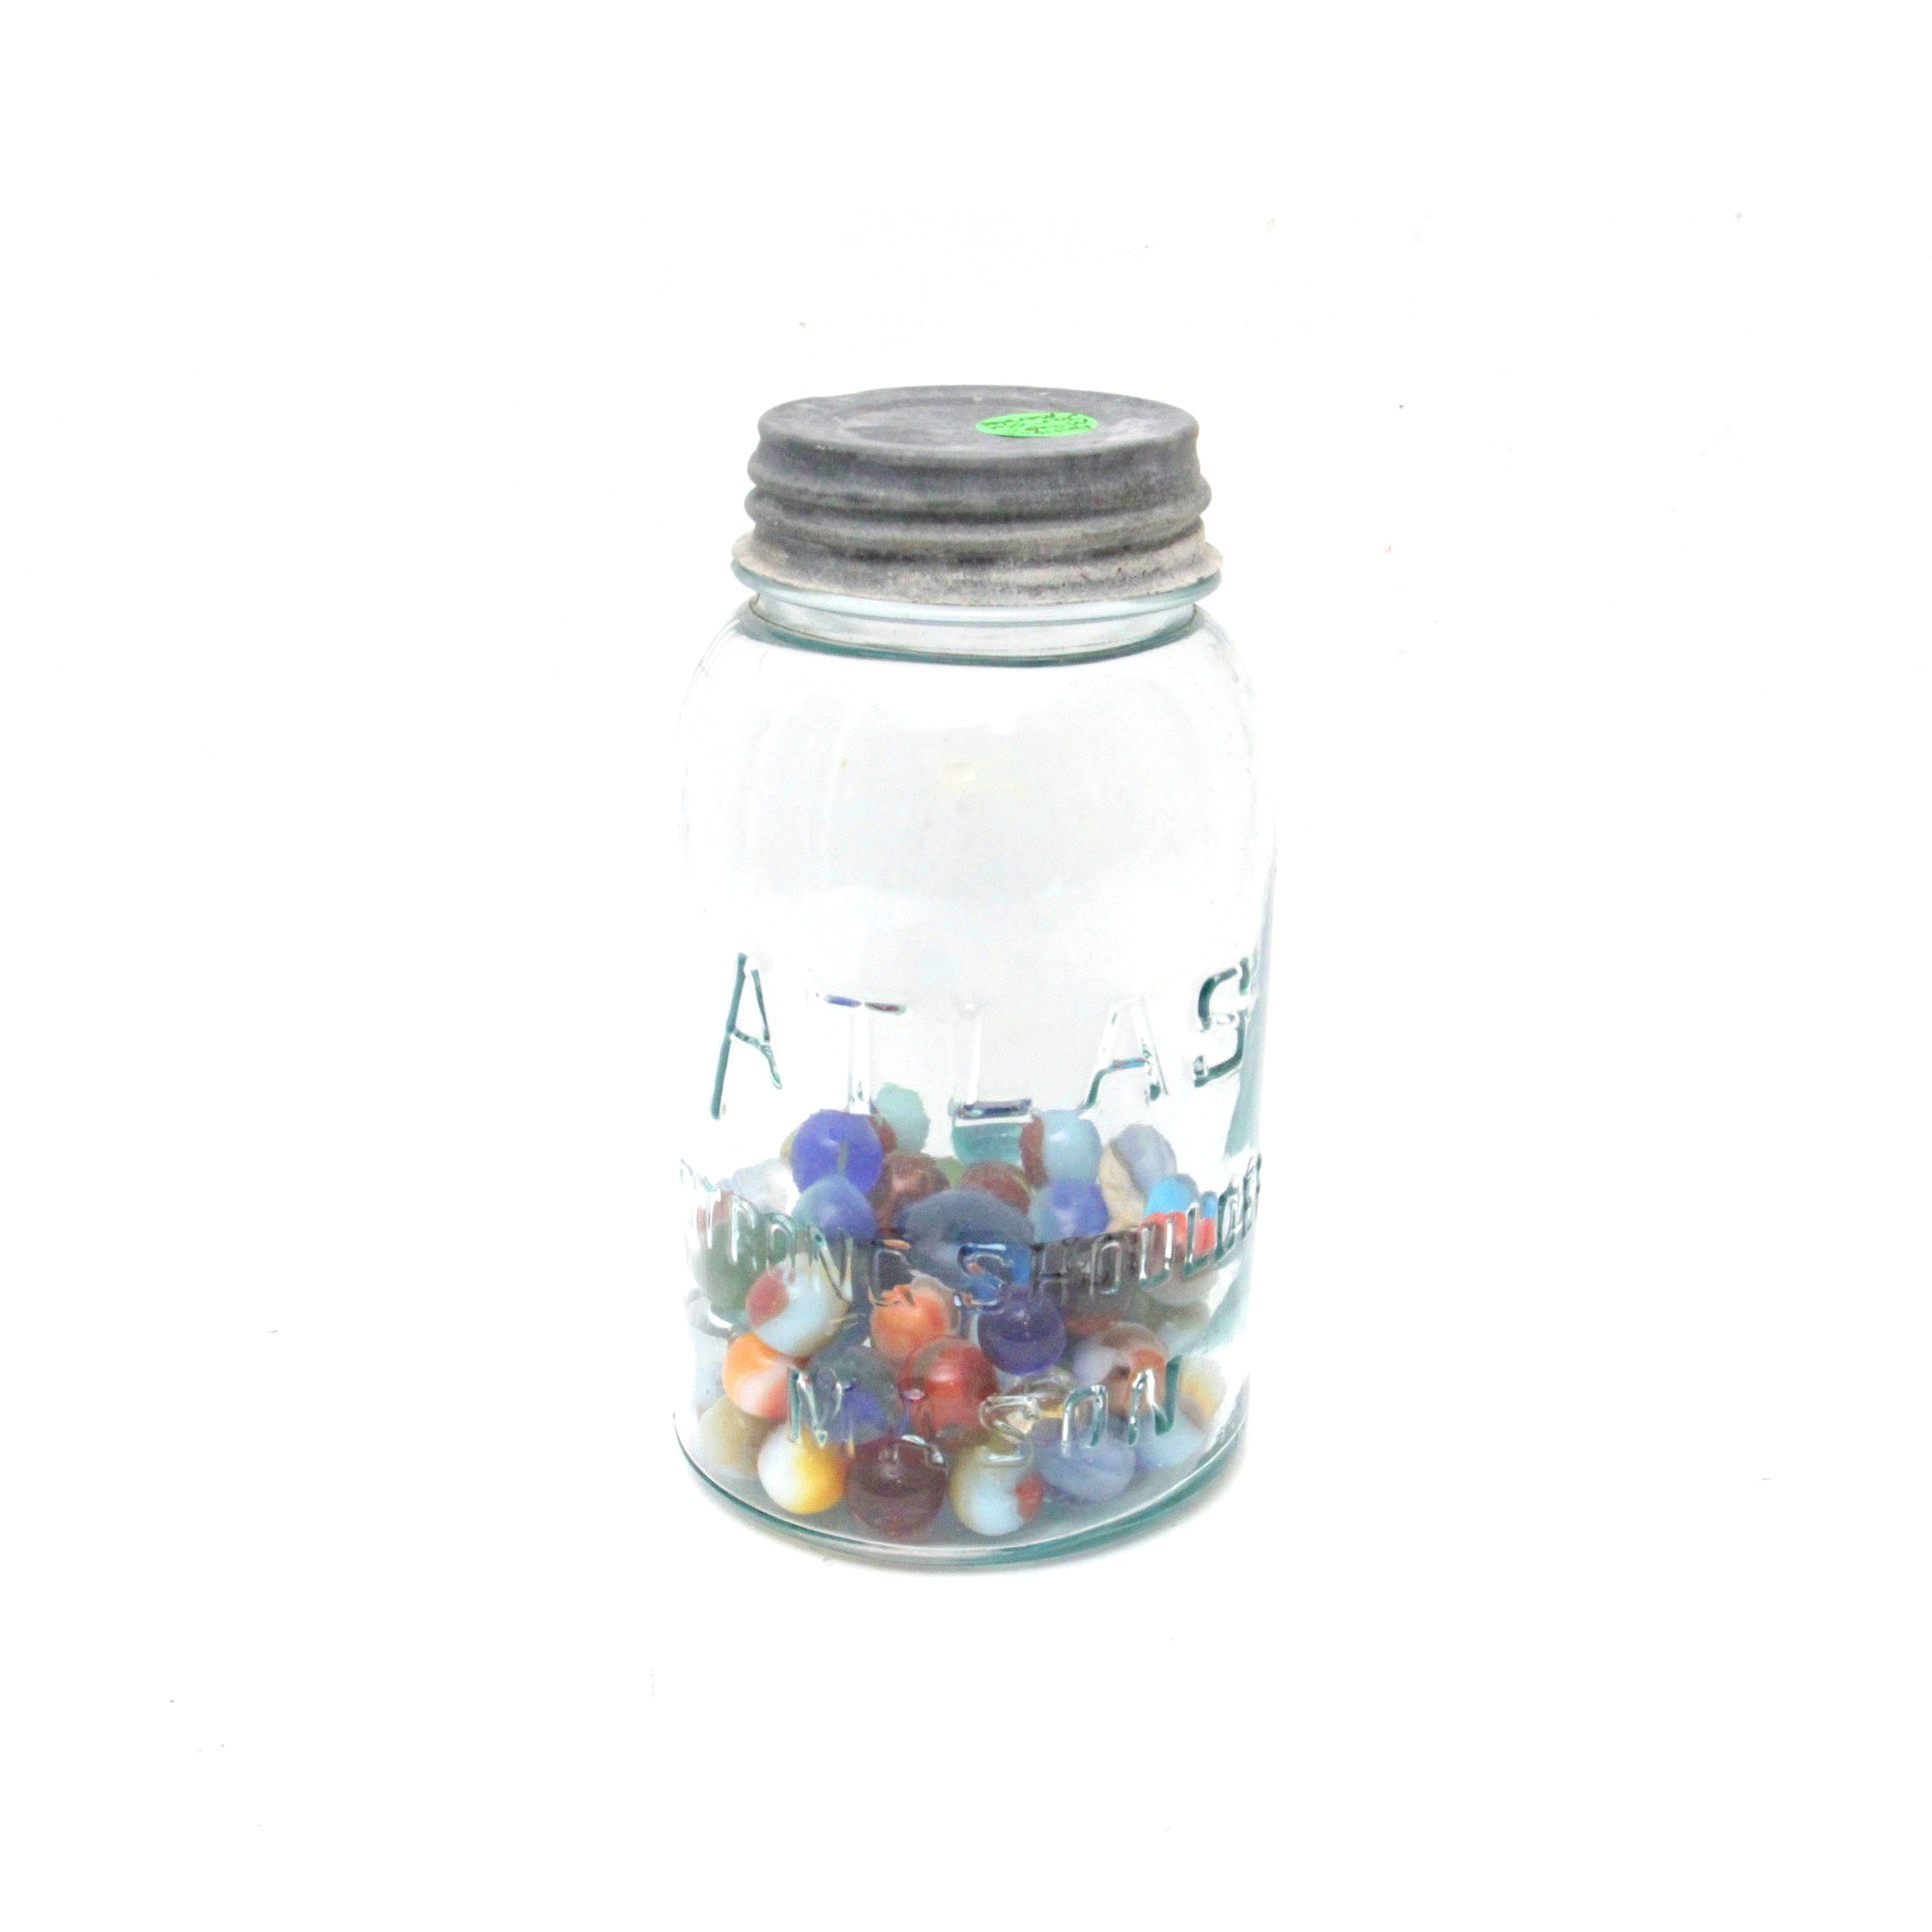 Vintage Marbles in Glass Mason Jar